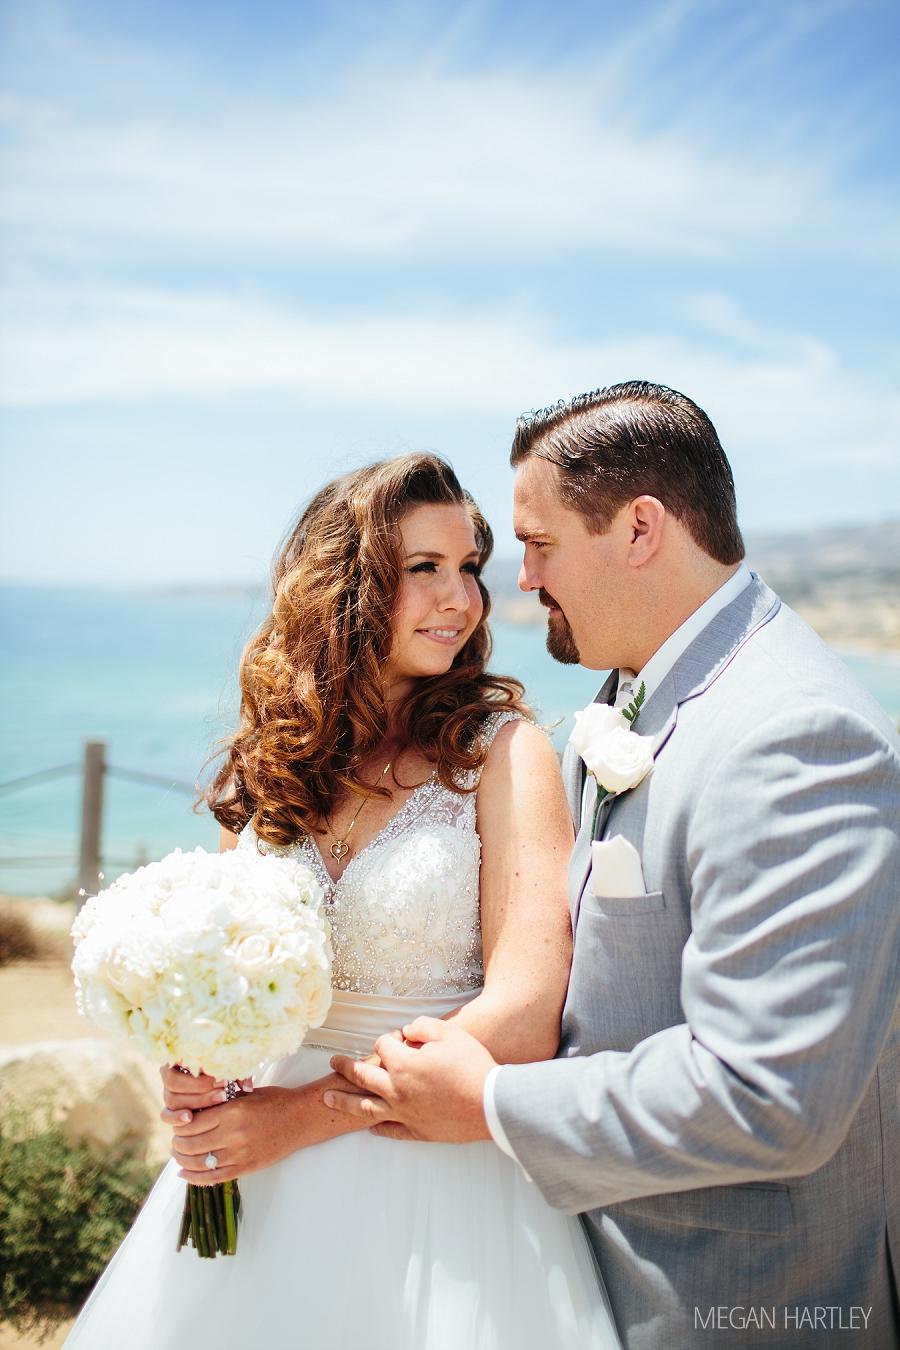 Megan Hartley Photography Palos Verdes Norris Center Wedding Photographer 00020